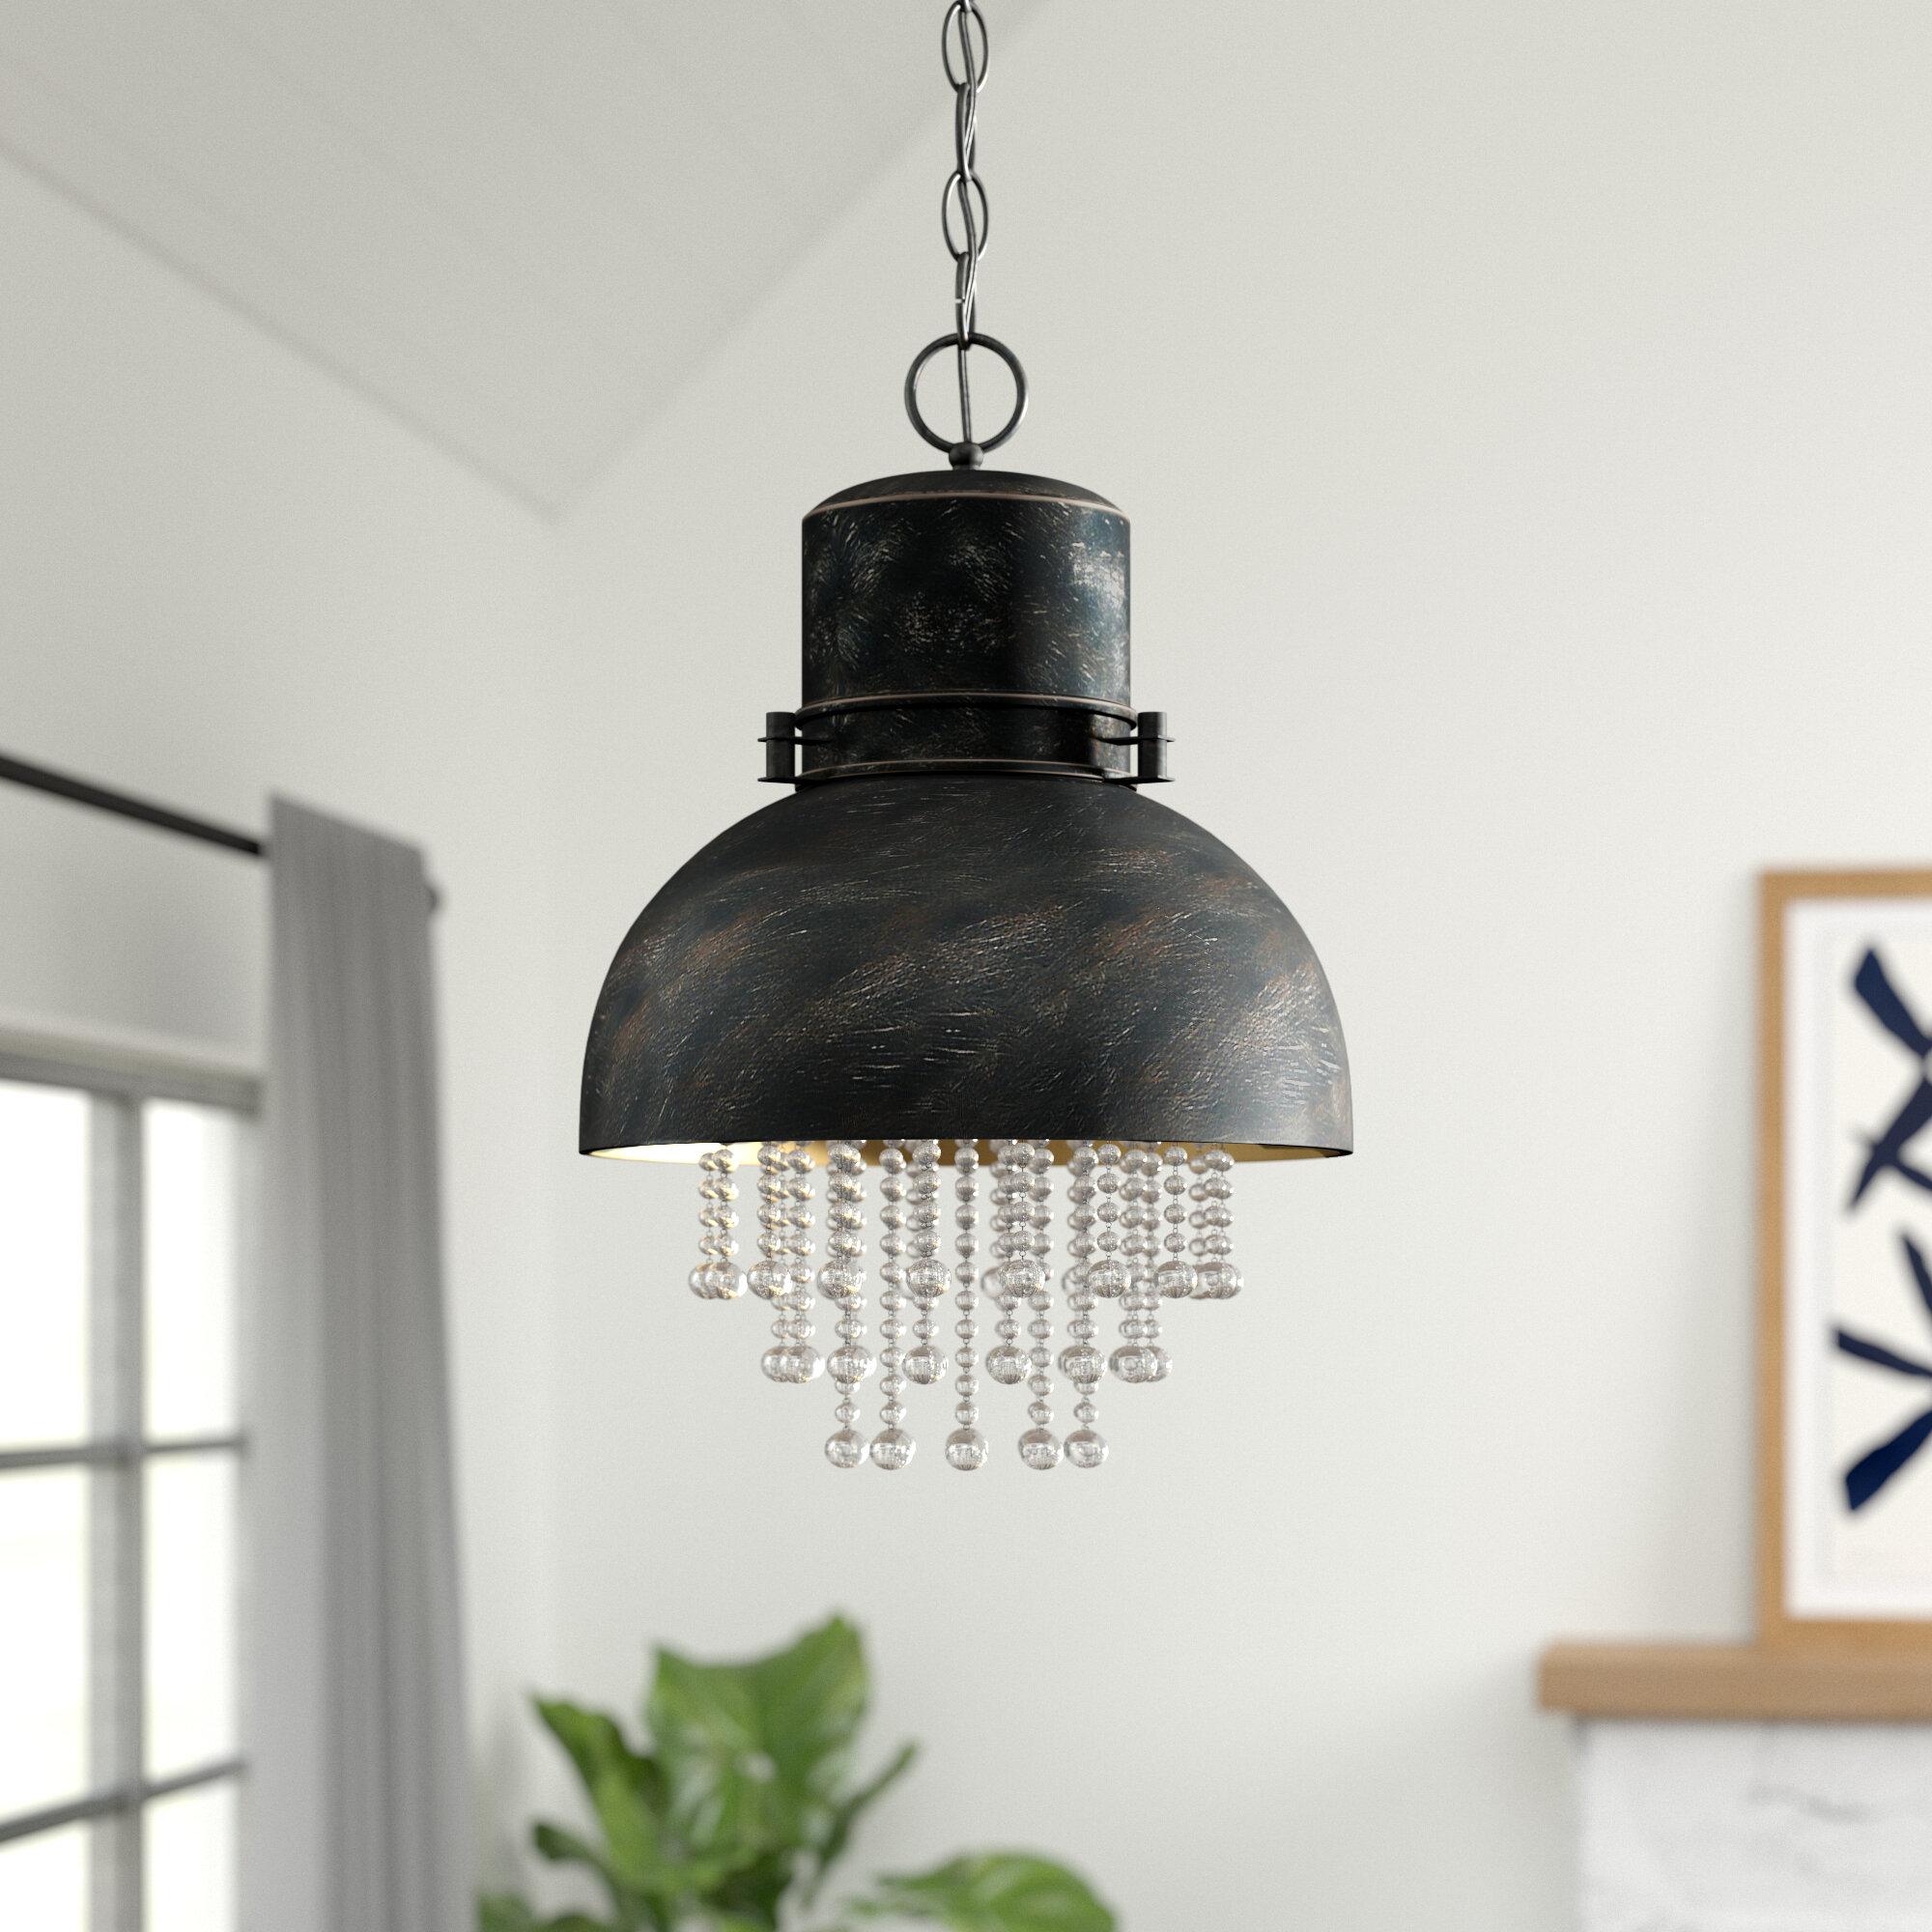 Popular Photo of Monadnock 1 Light Single Dome Pendants